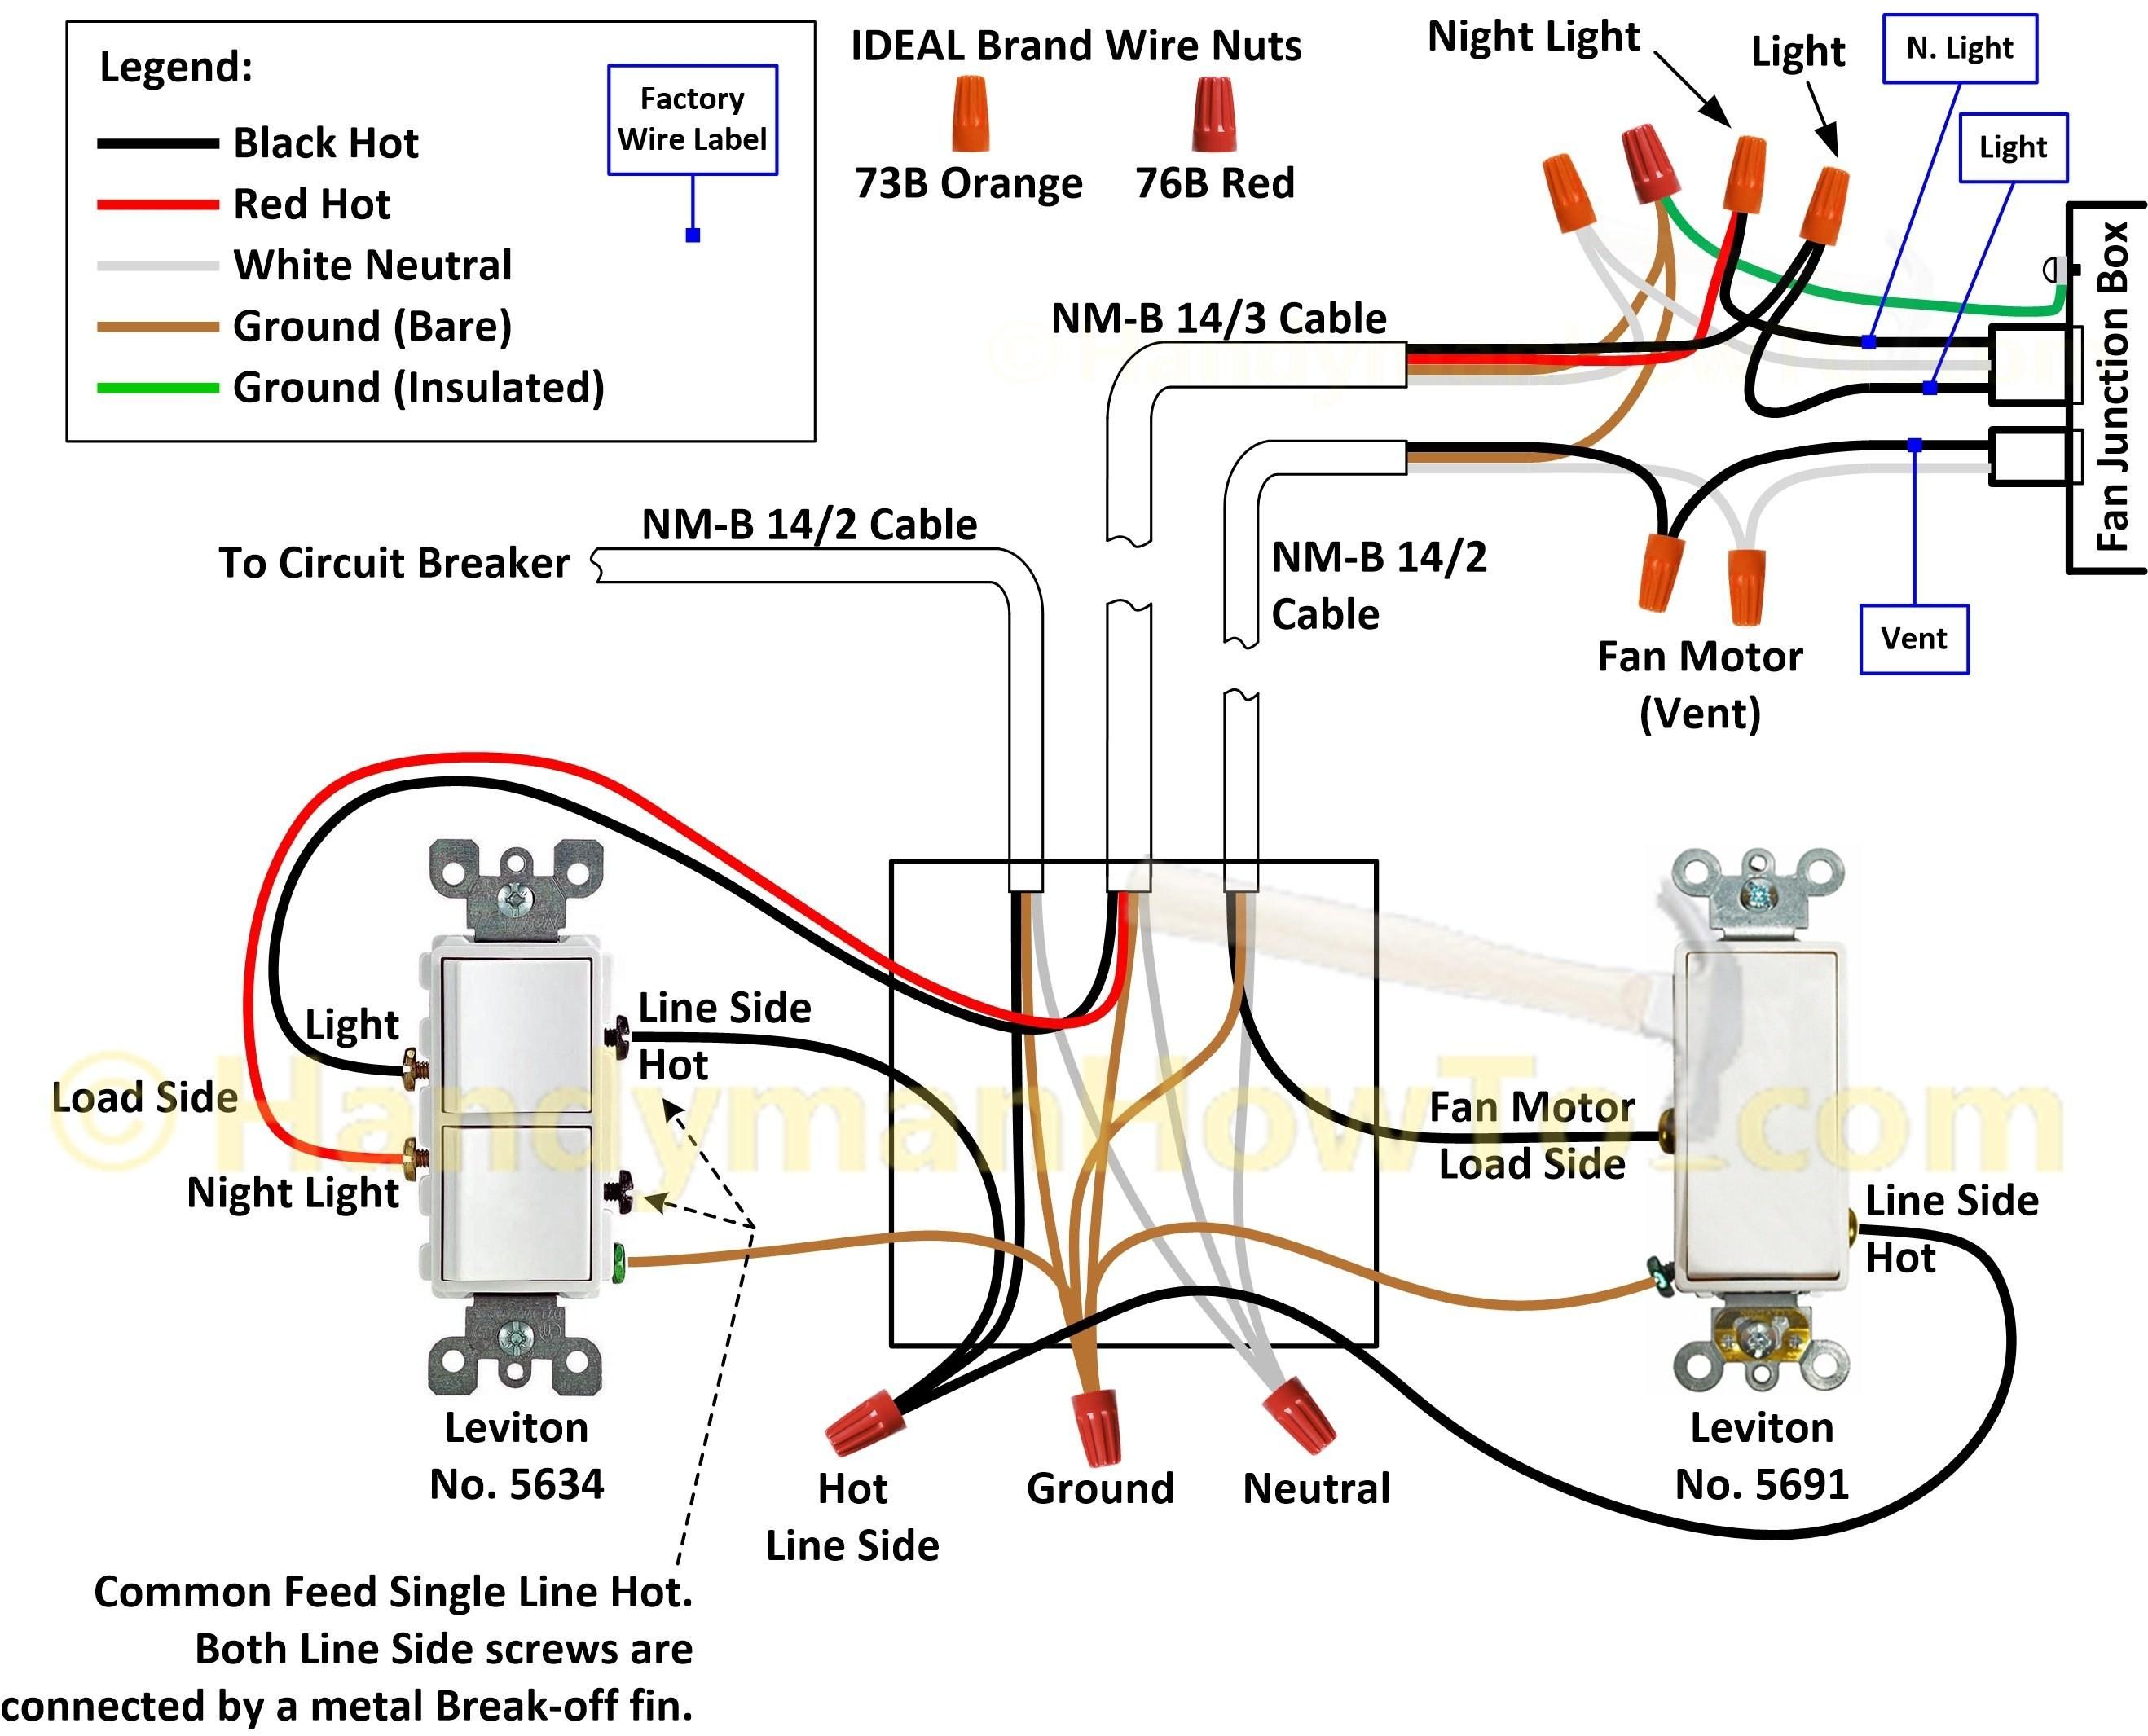 bathroom wiring diagram wiring diagram image rh mainetreasurechest com Bathroom Wiring Diagram with Vent Bathroom GFCI Wiring -Diagram